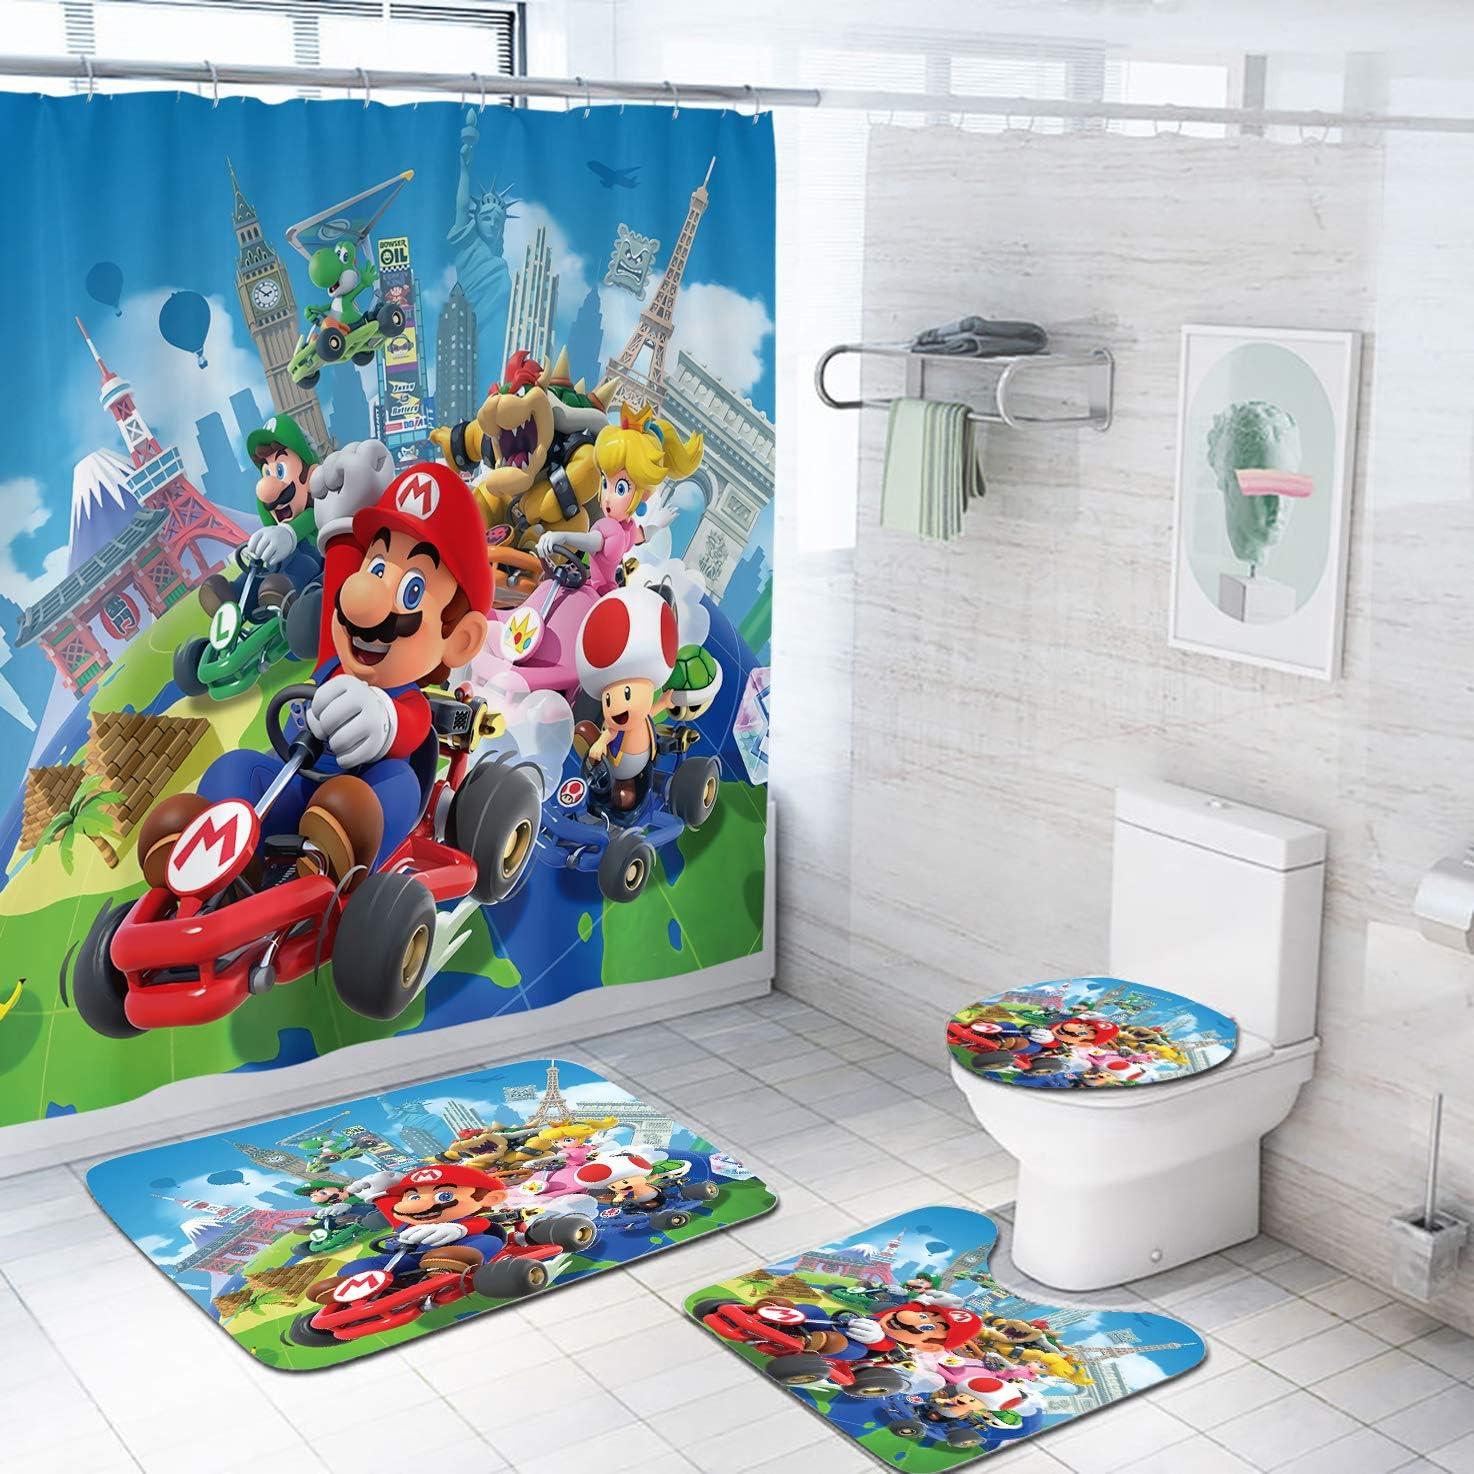 Coxila Super Mario Shower Curtain Sets Bath Mat 4 Pcs Decor Bathroom Cartoon Kids Funny Travel Contour Mat Toilet Lid Cover U Shaped Non-Slip Rug Fabric Polyester 60x72 Inch